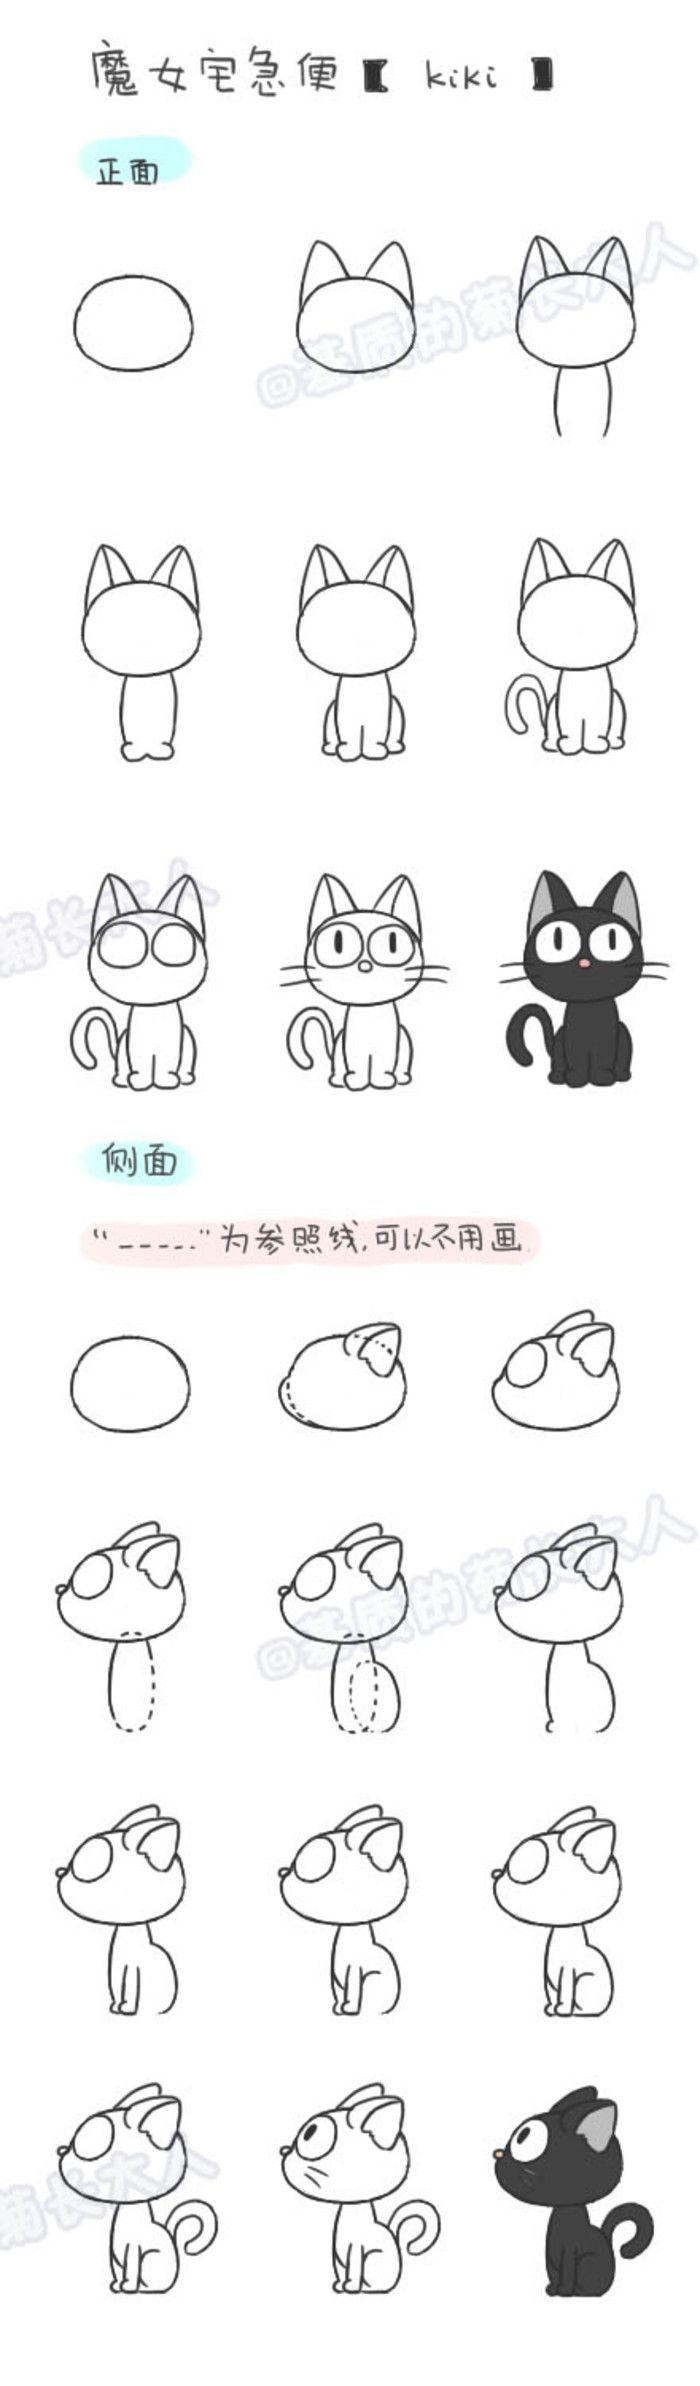 "ment dessiner un chat kawaii Kiki Cat å¦'何ç"" 《é""å¥³å …æ€¥ä¾¿ KIKI"